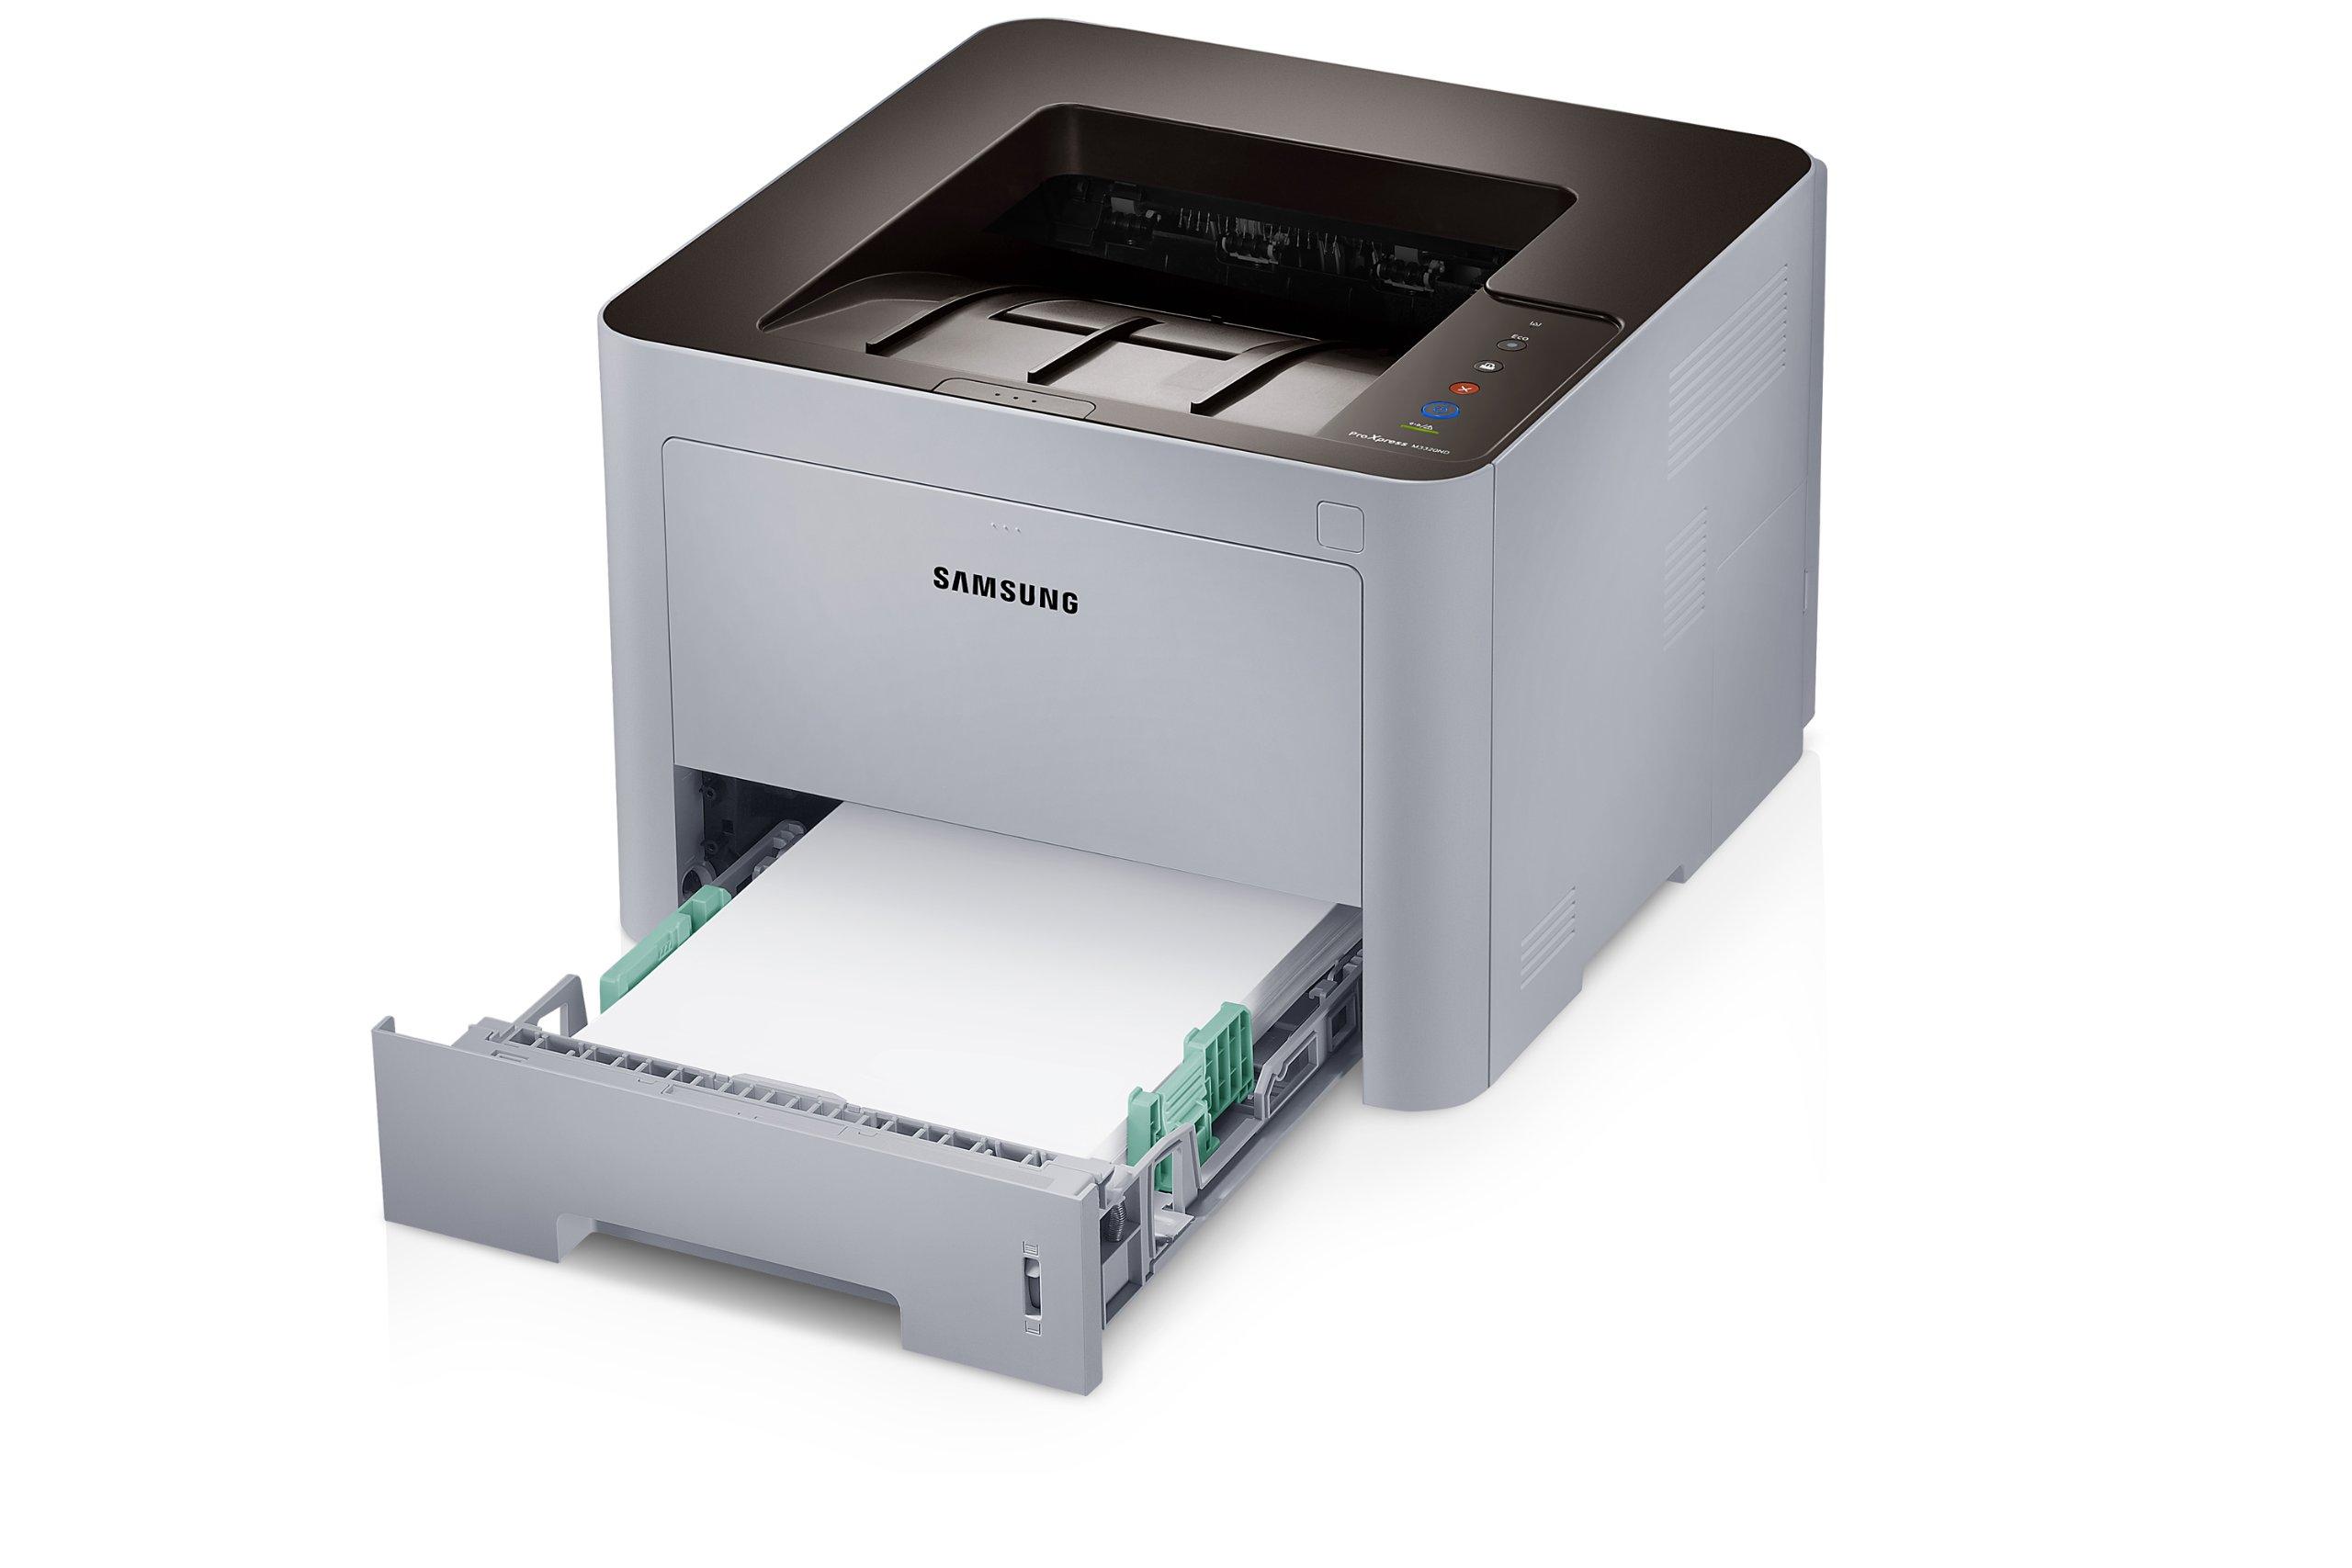 Samsung ProXpress SL-M3320ND Monochrome Printer